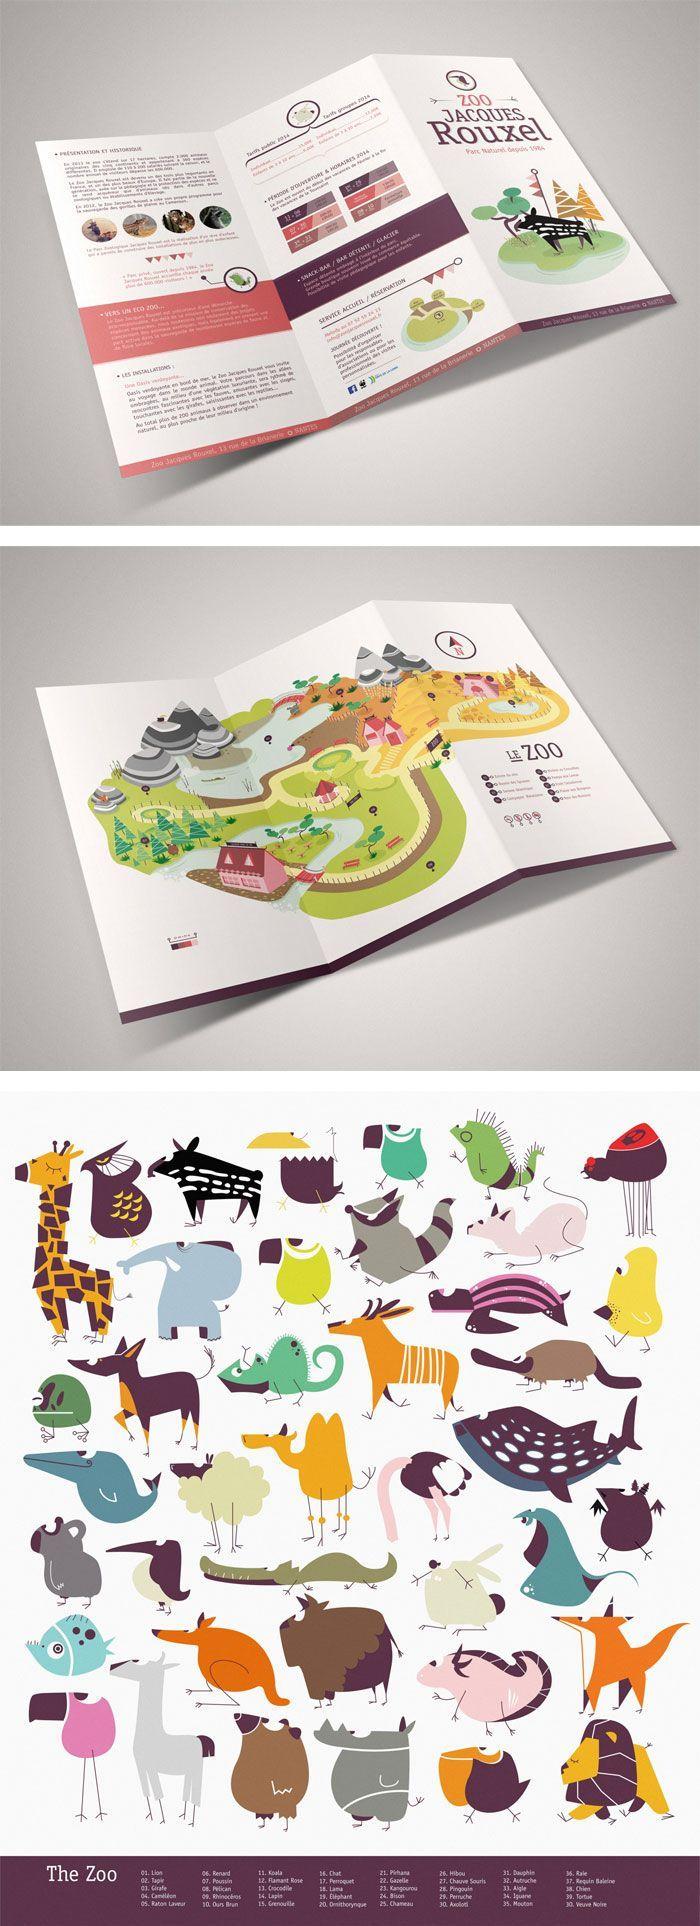 beautiful zoo brochure design | Alliteration Inspiration: Zoos & Zzz's #printdesign